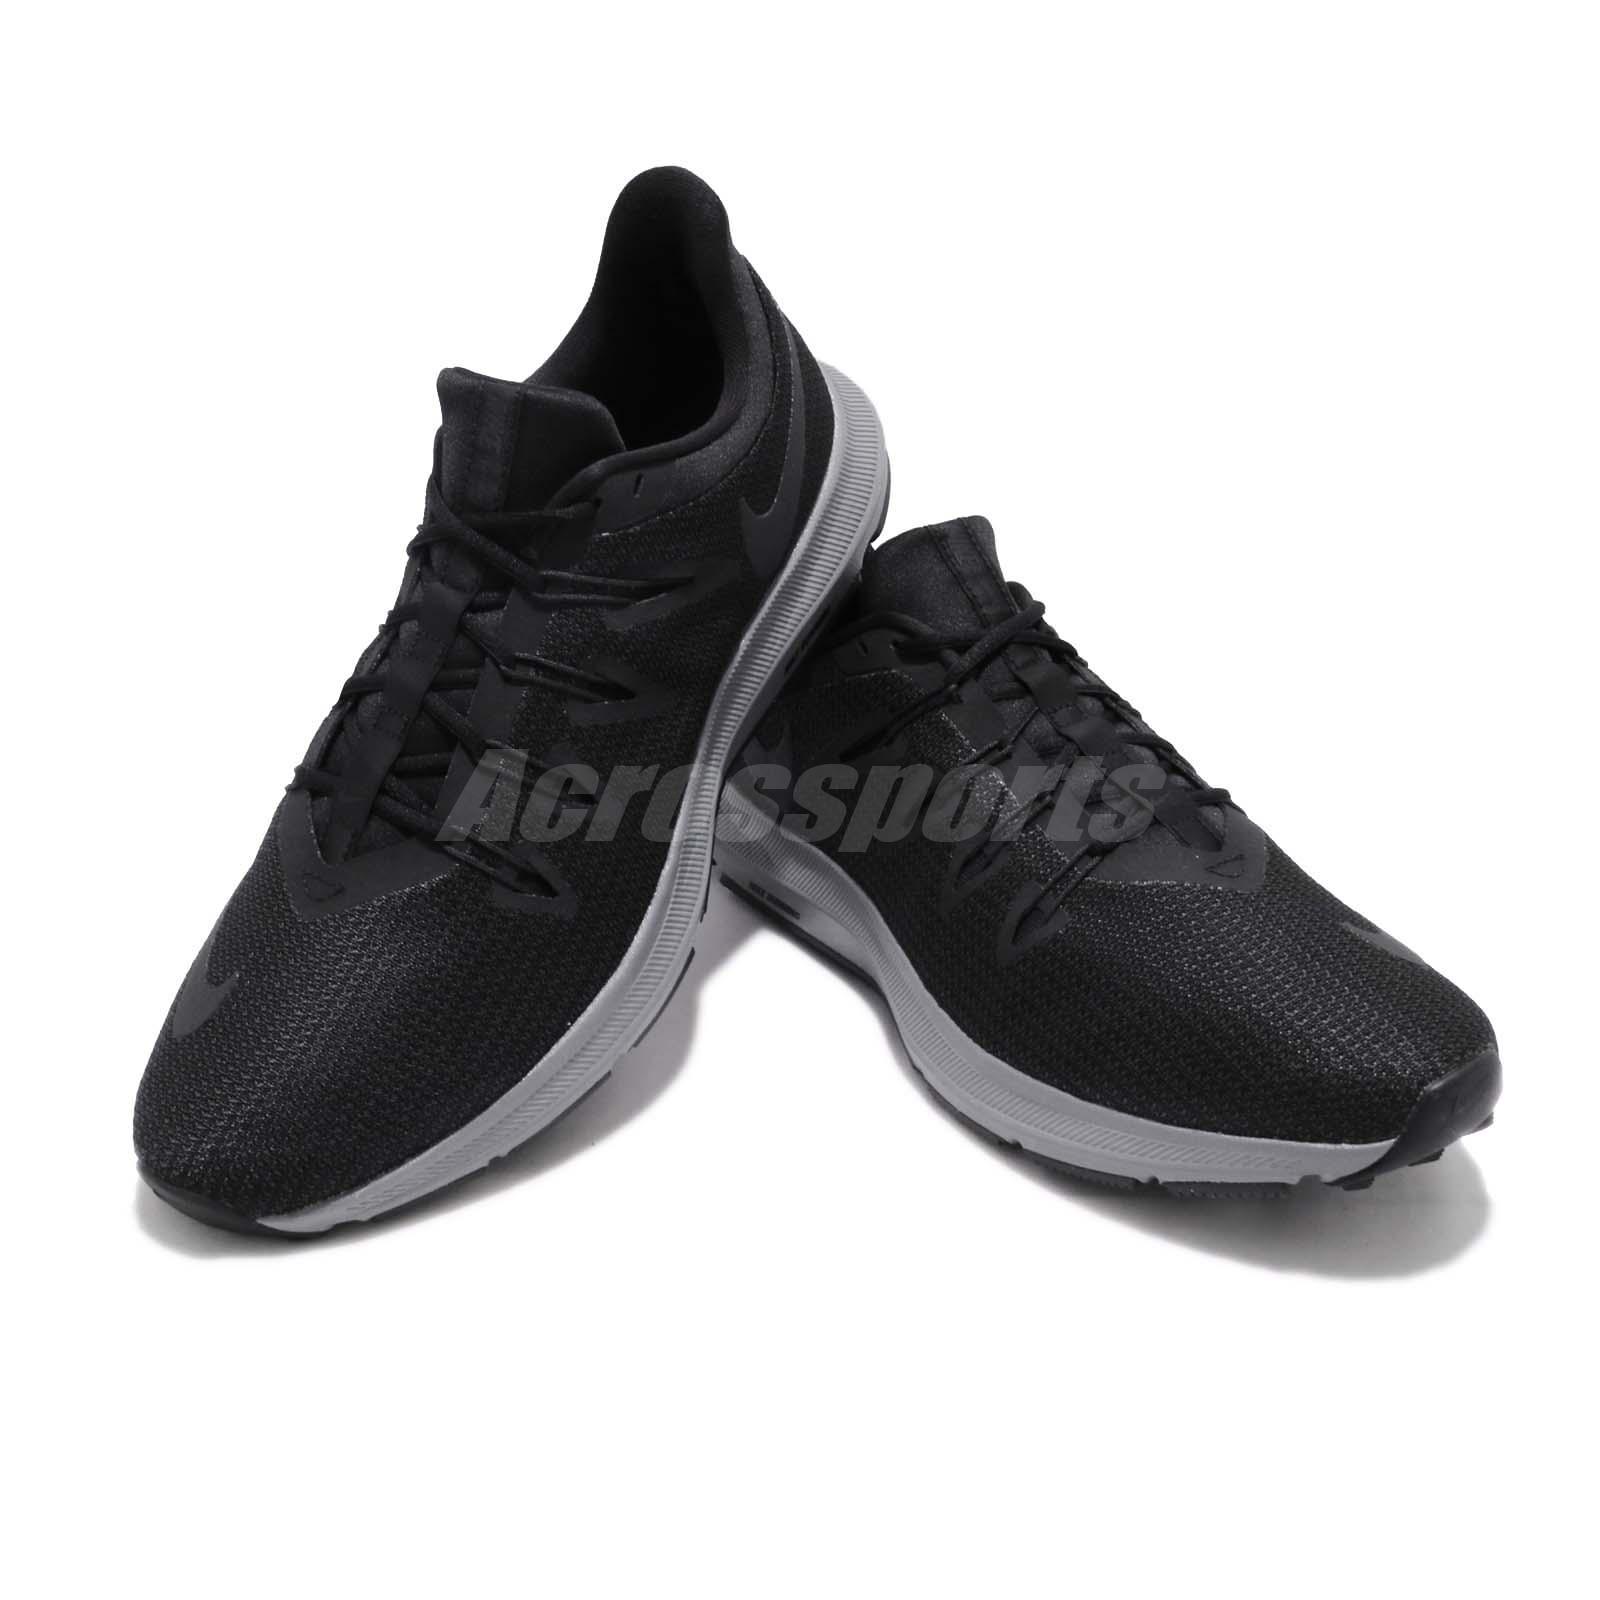 c47c6c265ea19 Nike Quest Black Anthracite Grey Men Running Training Shoes Sneakers ...